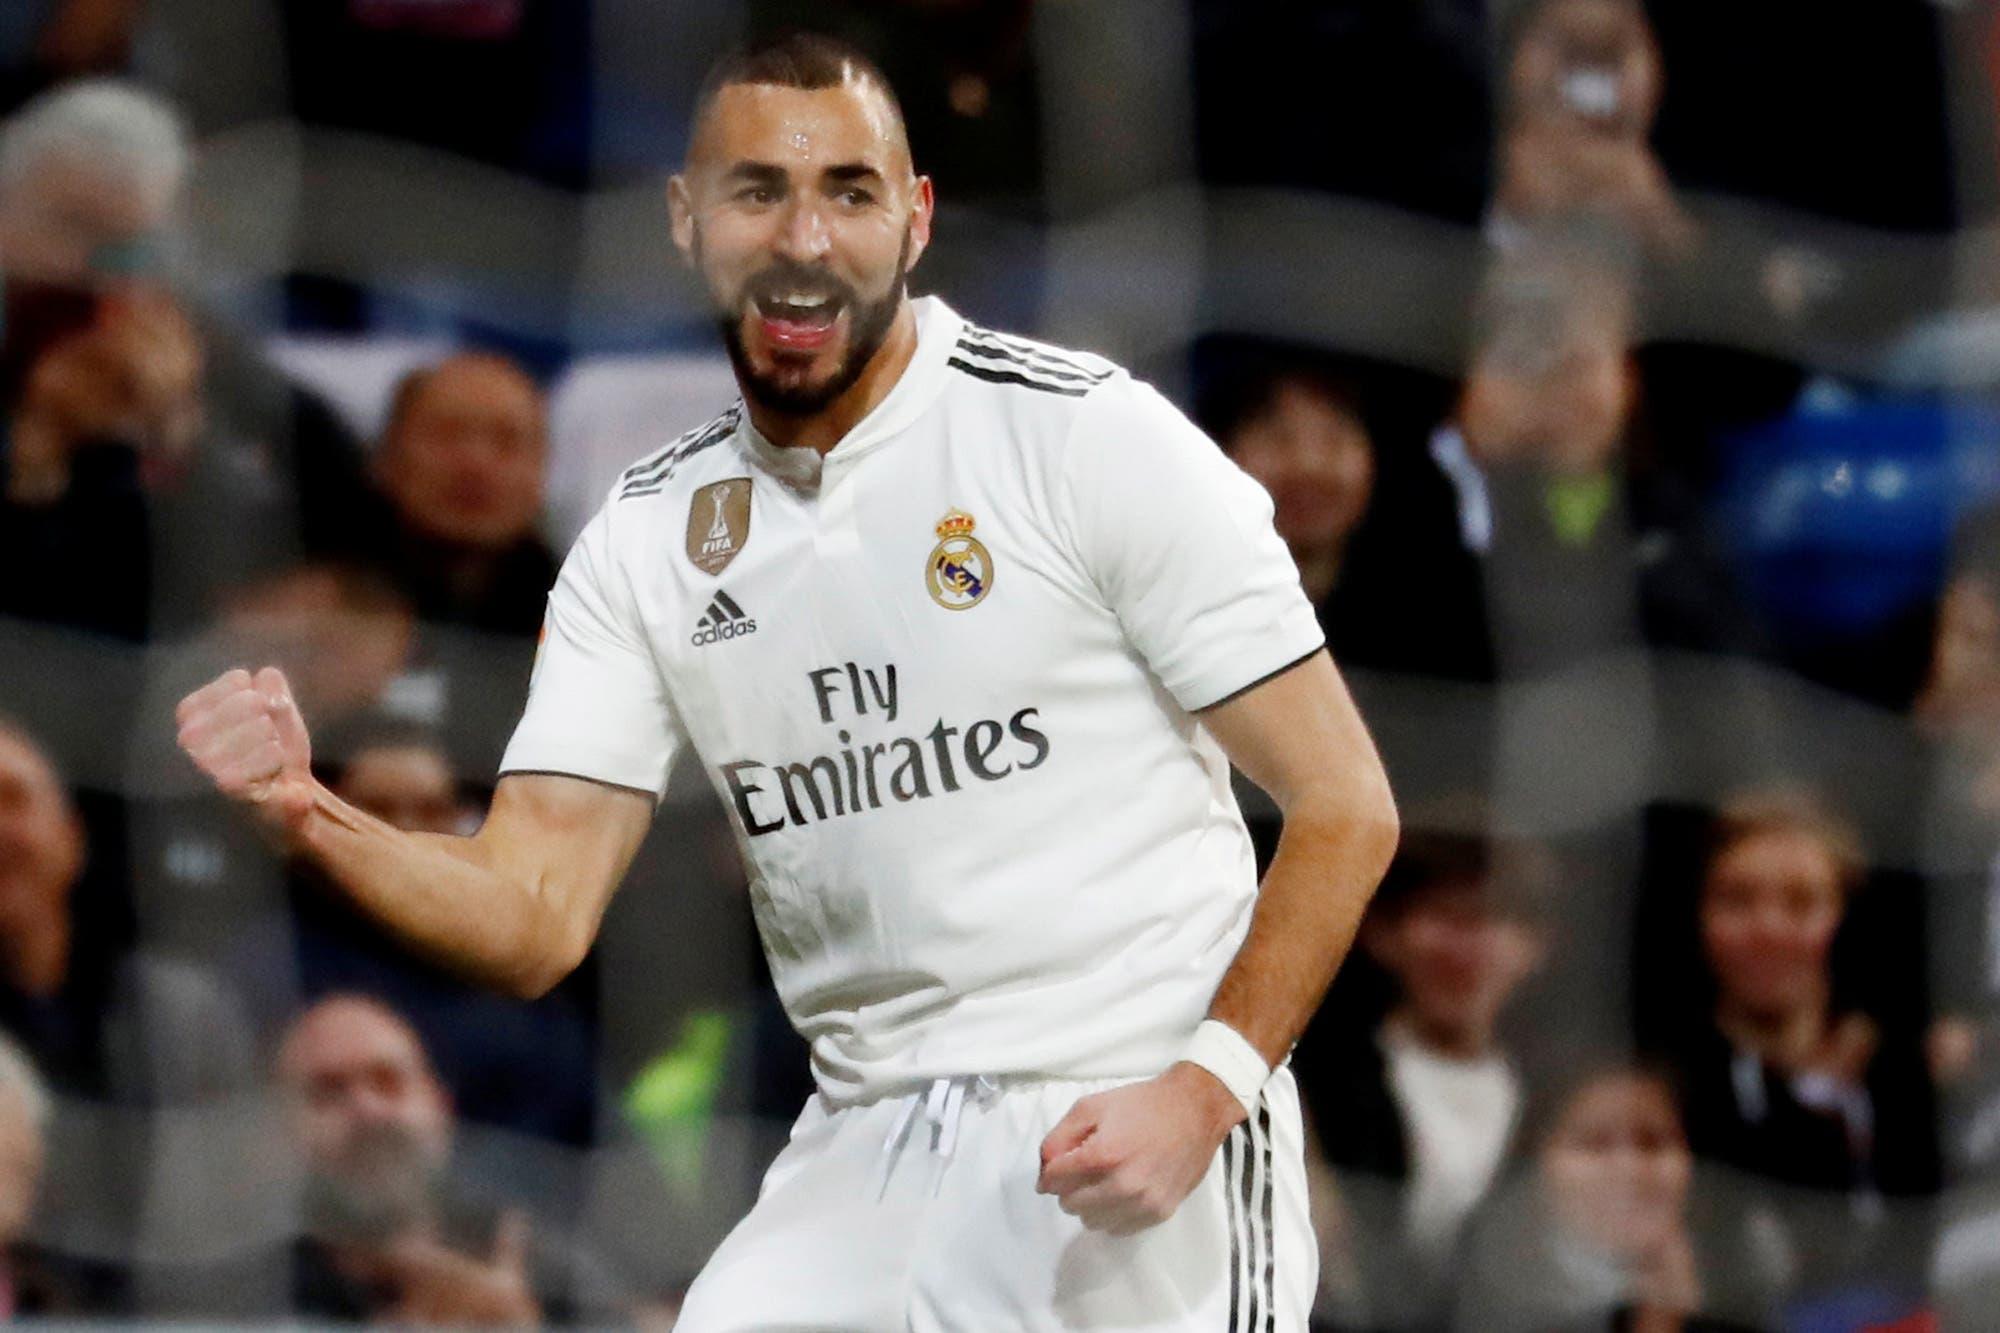 Mundial de Clubes: Real Madrid no tiene buena pinta, aunque Santiago Solari es optimista